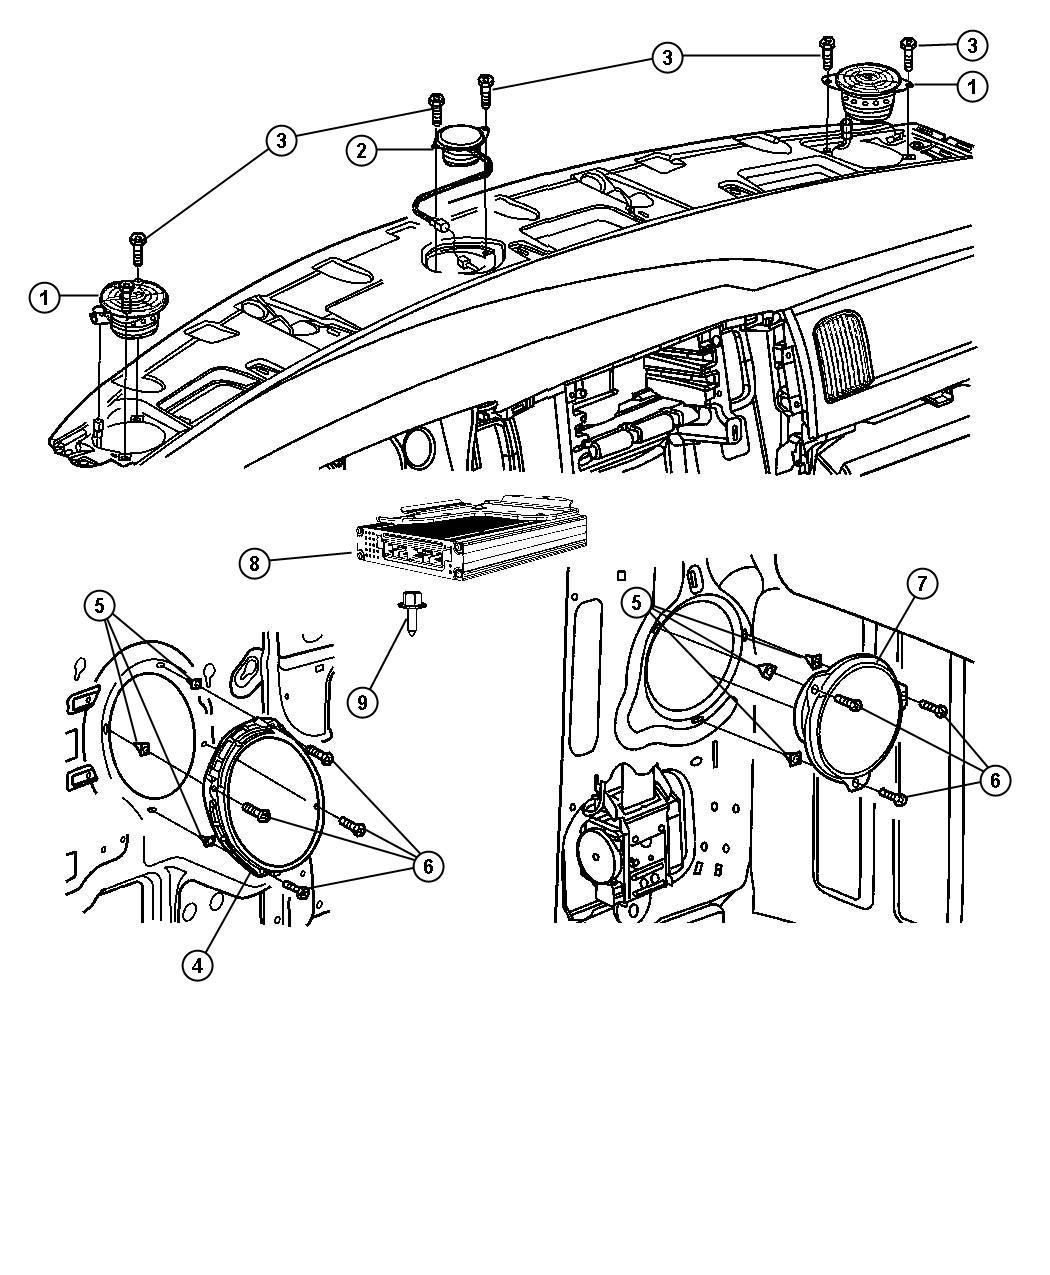 tags: #2008 toyota tundra wiring diagram#2008 gmc sierra wiring diagram#2008  ford focus wiring diagram#2008 jeep wrangler wiring diagram#2008 mazda 3  wiring